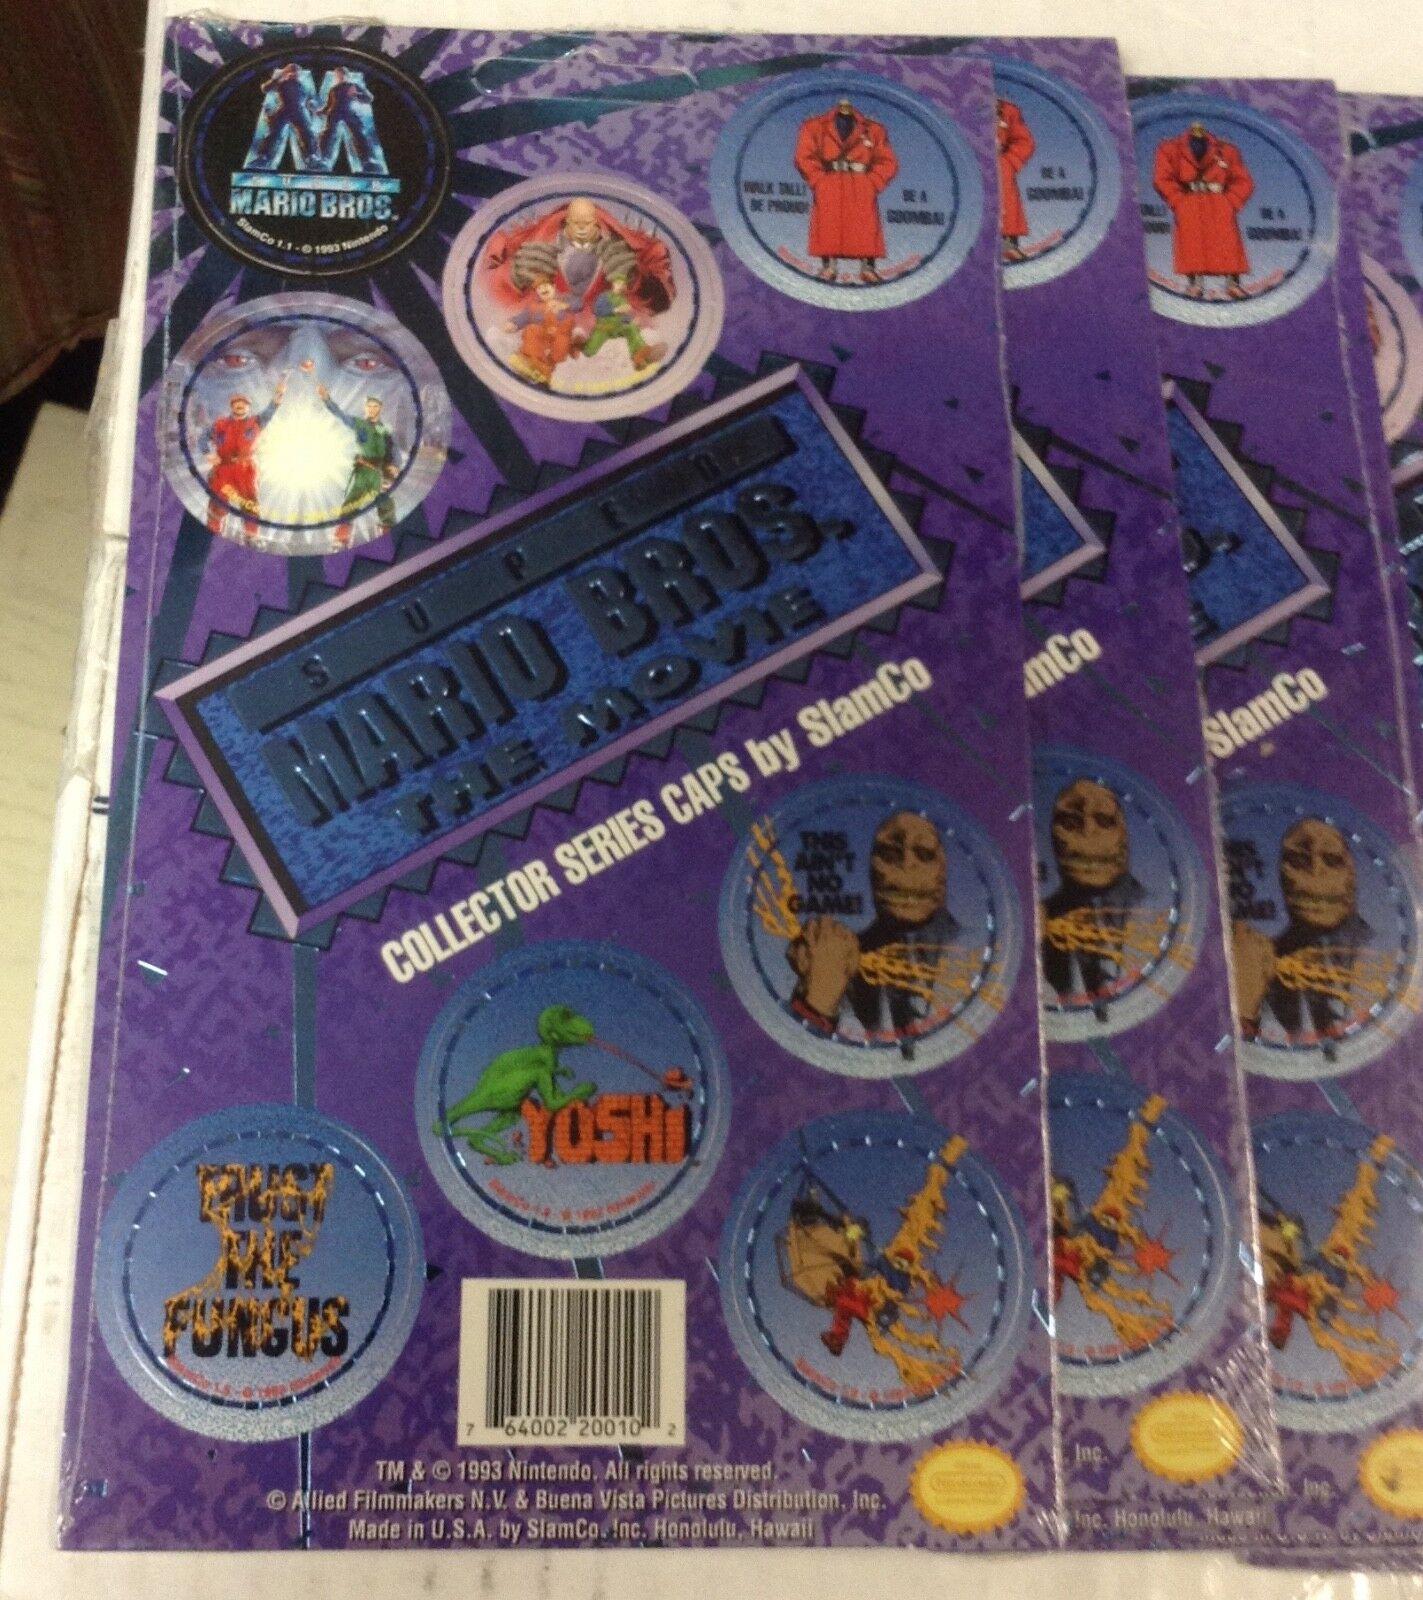 UPC 764002200102 - Super Mario Bros  The Movie Collector